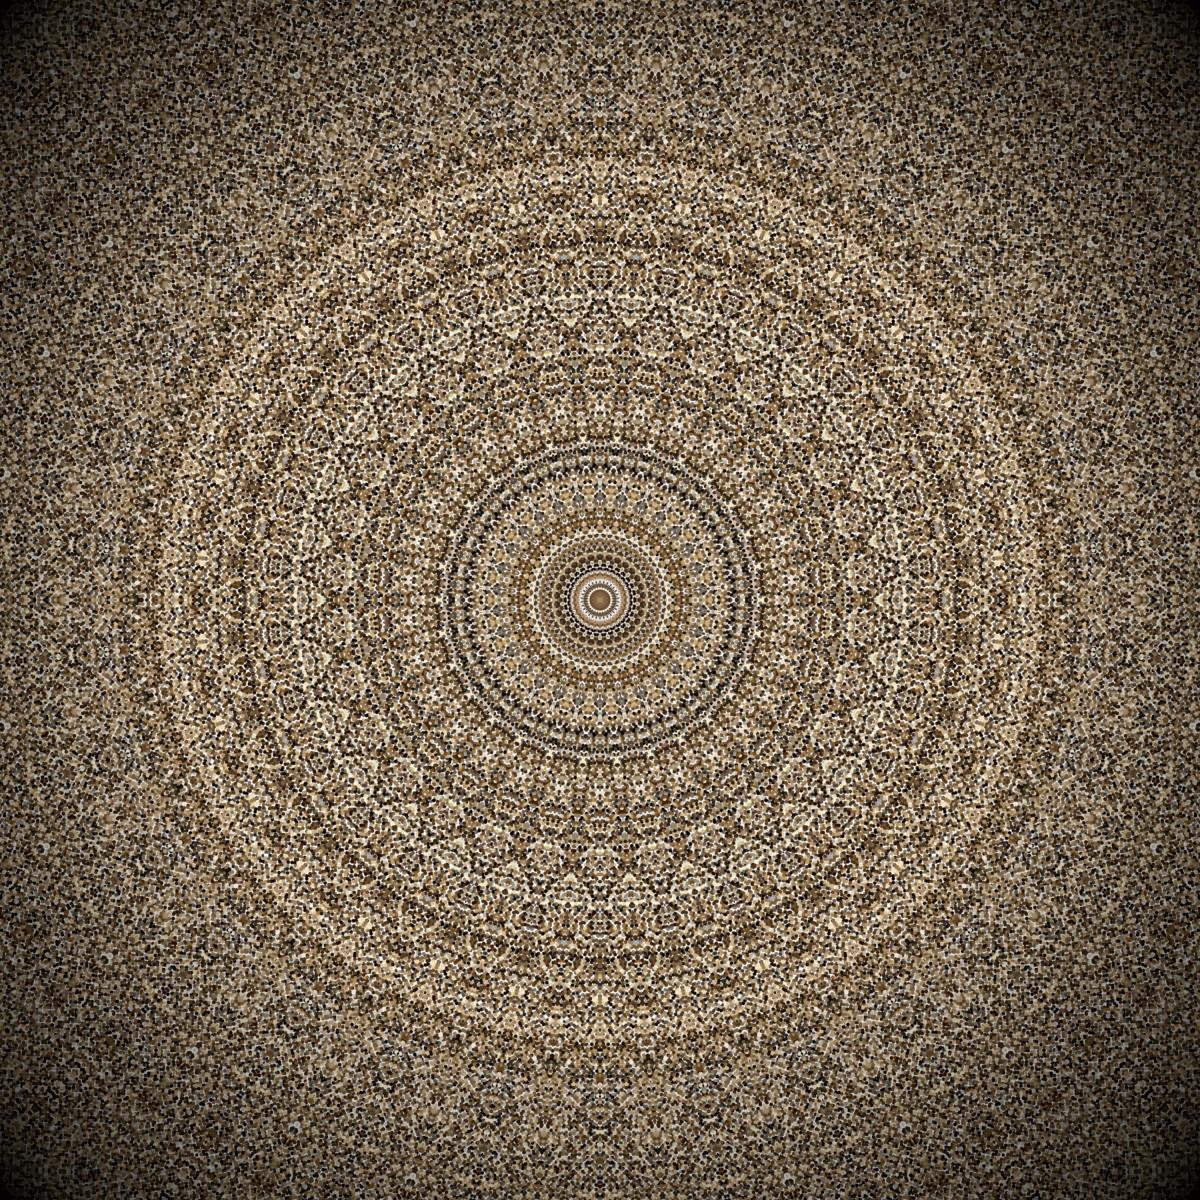 free images mandala background pattern kaleidoscope. Black Bedroom Furniture Sets. Home Design Ideas